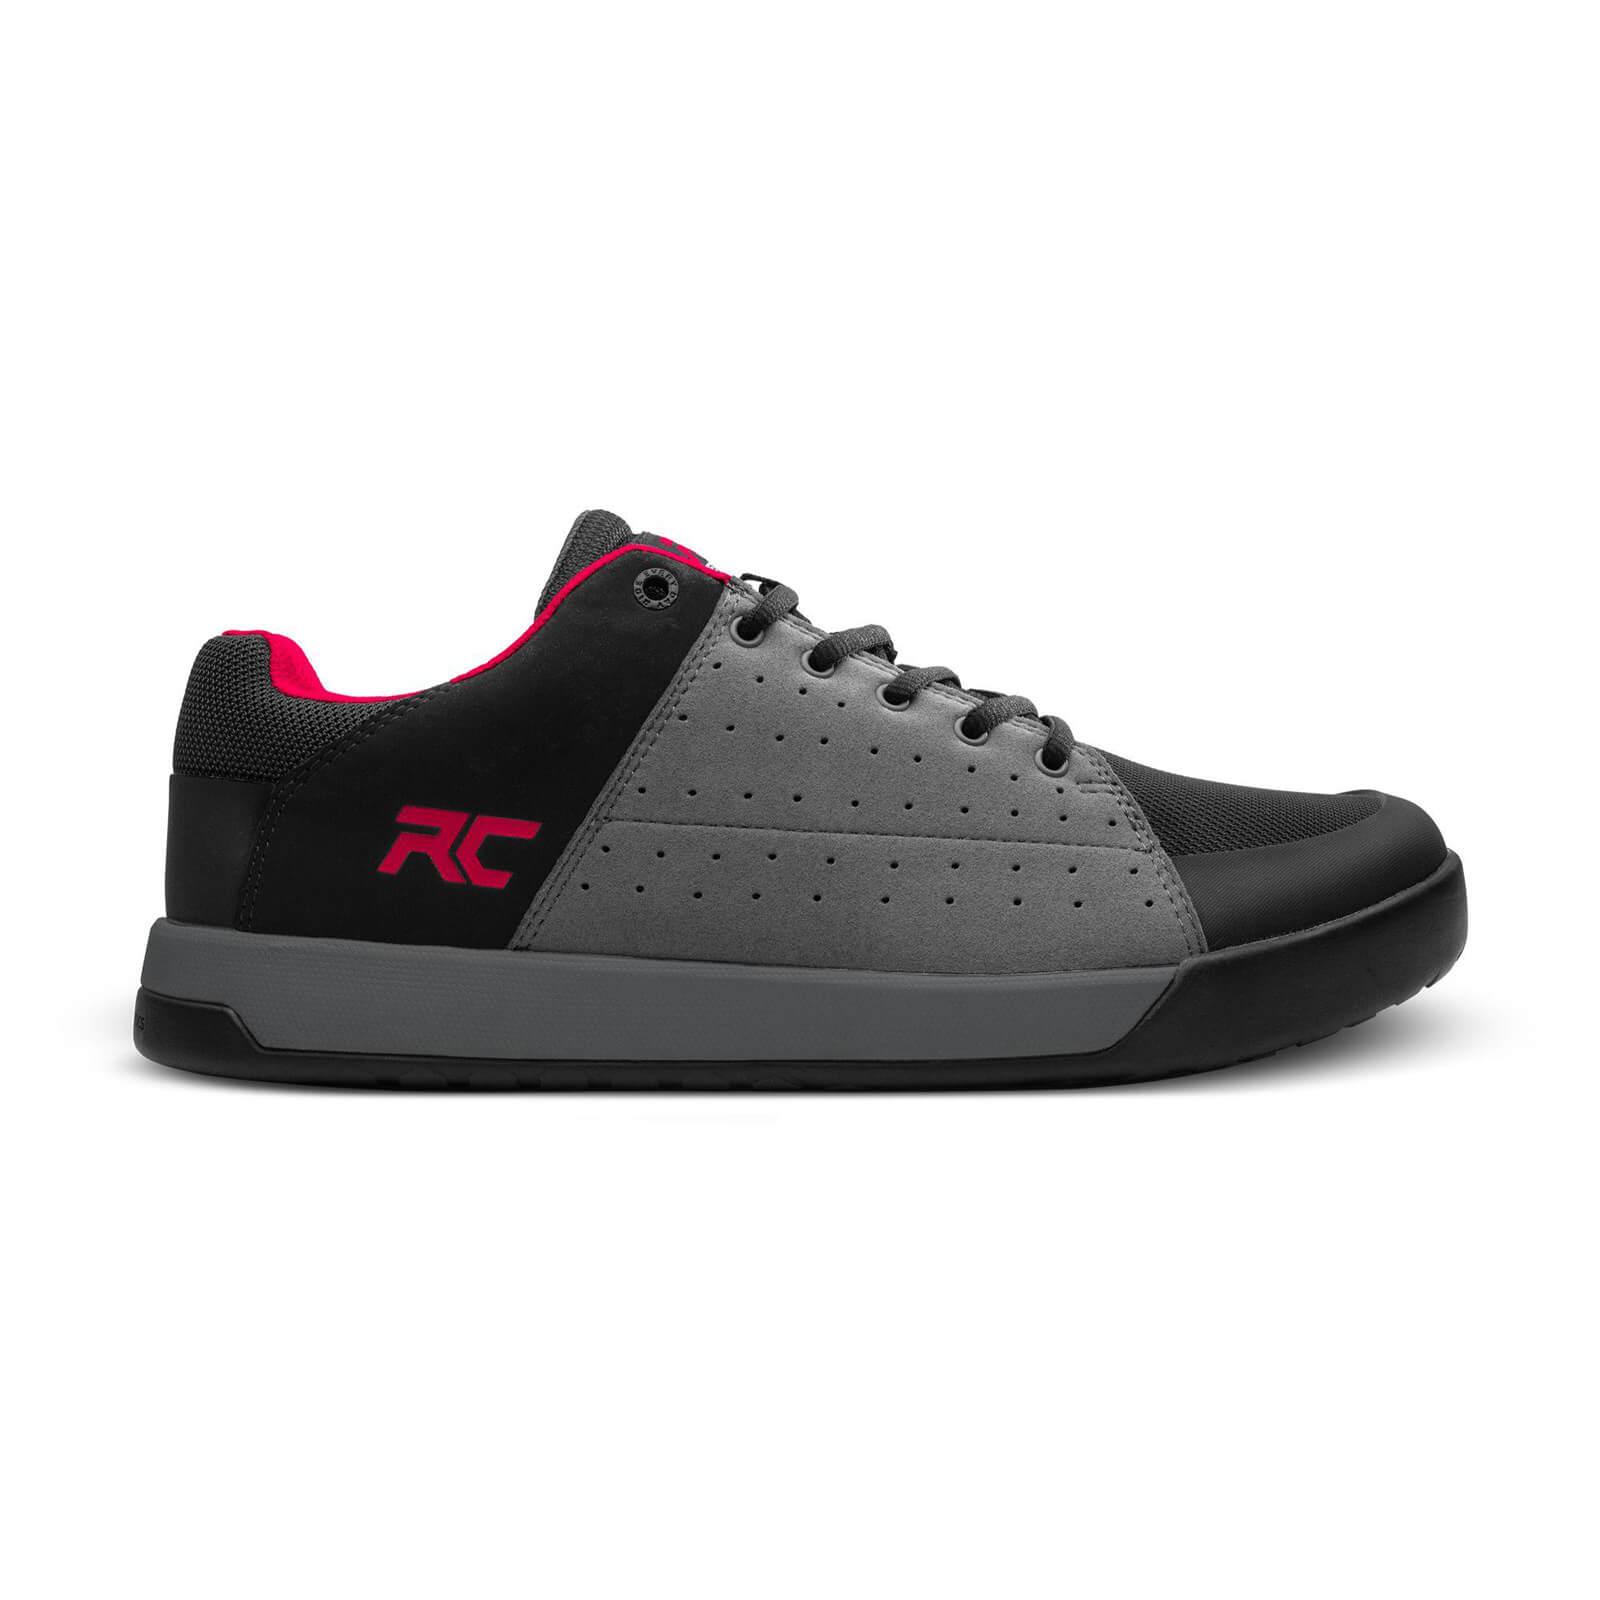 Ride Concepts Livewire Flat MTB Shoes - UK 7/EU 41 - Charcoal/Red